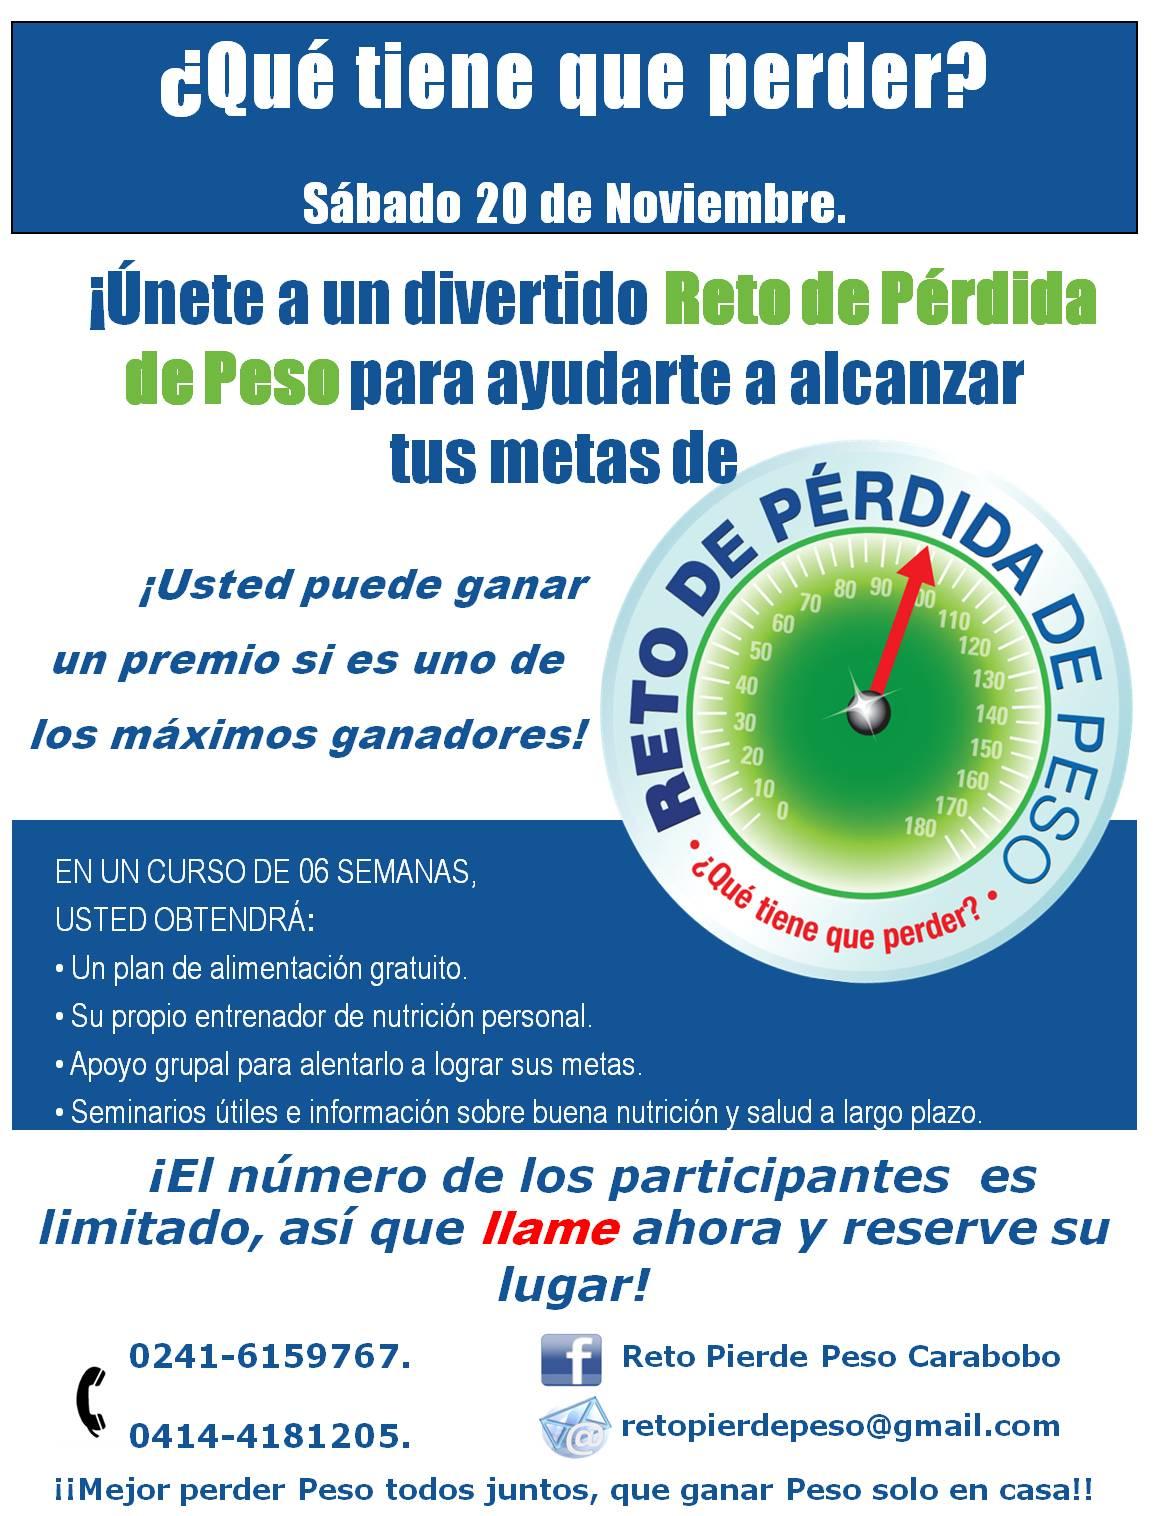 Reto Pierde Peso Carabobo: Reserve su Lugar YA!..